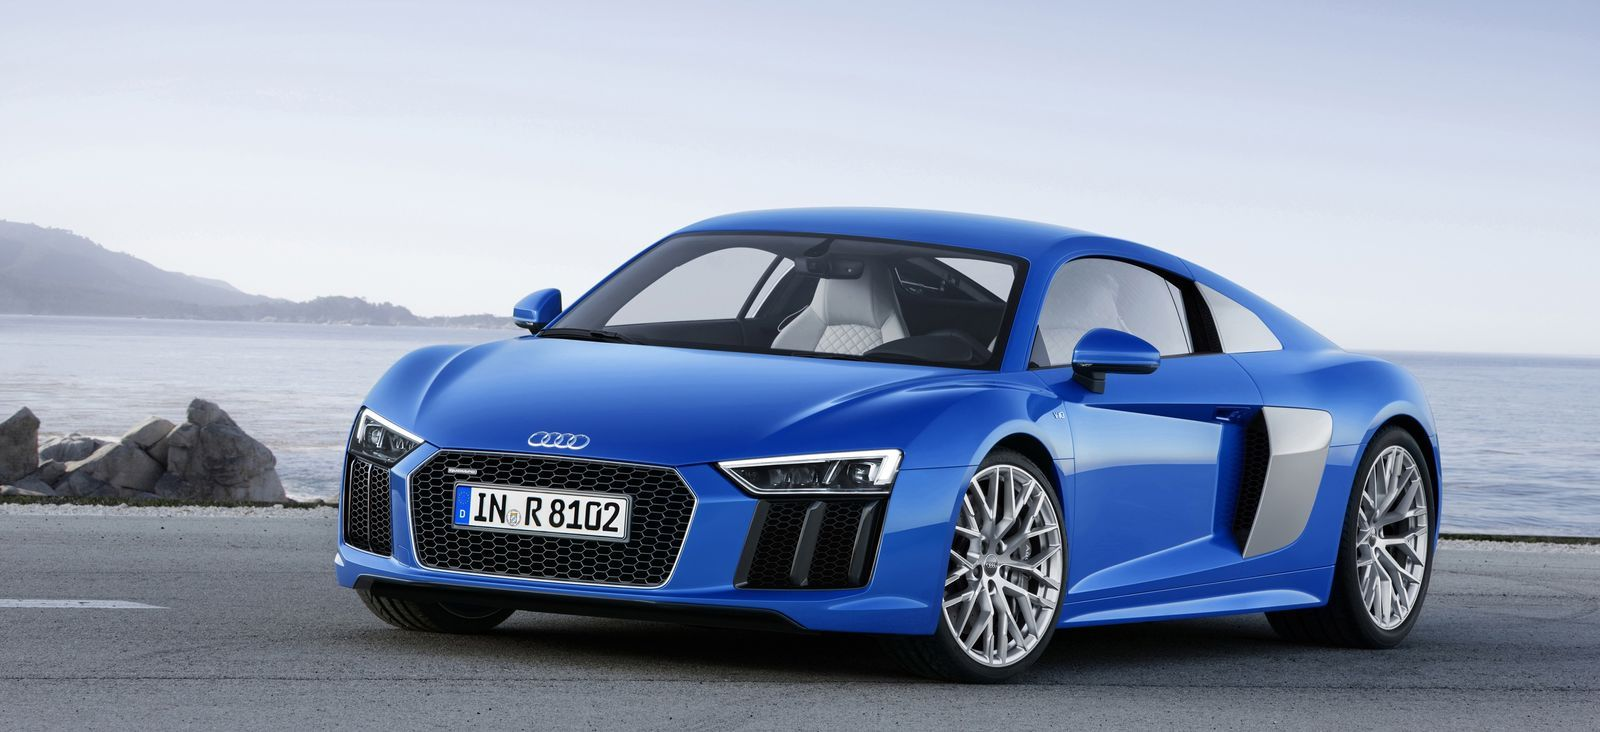 Audis Quattro Division Set To Rename Audi Sport The German Based - Audi car maker